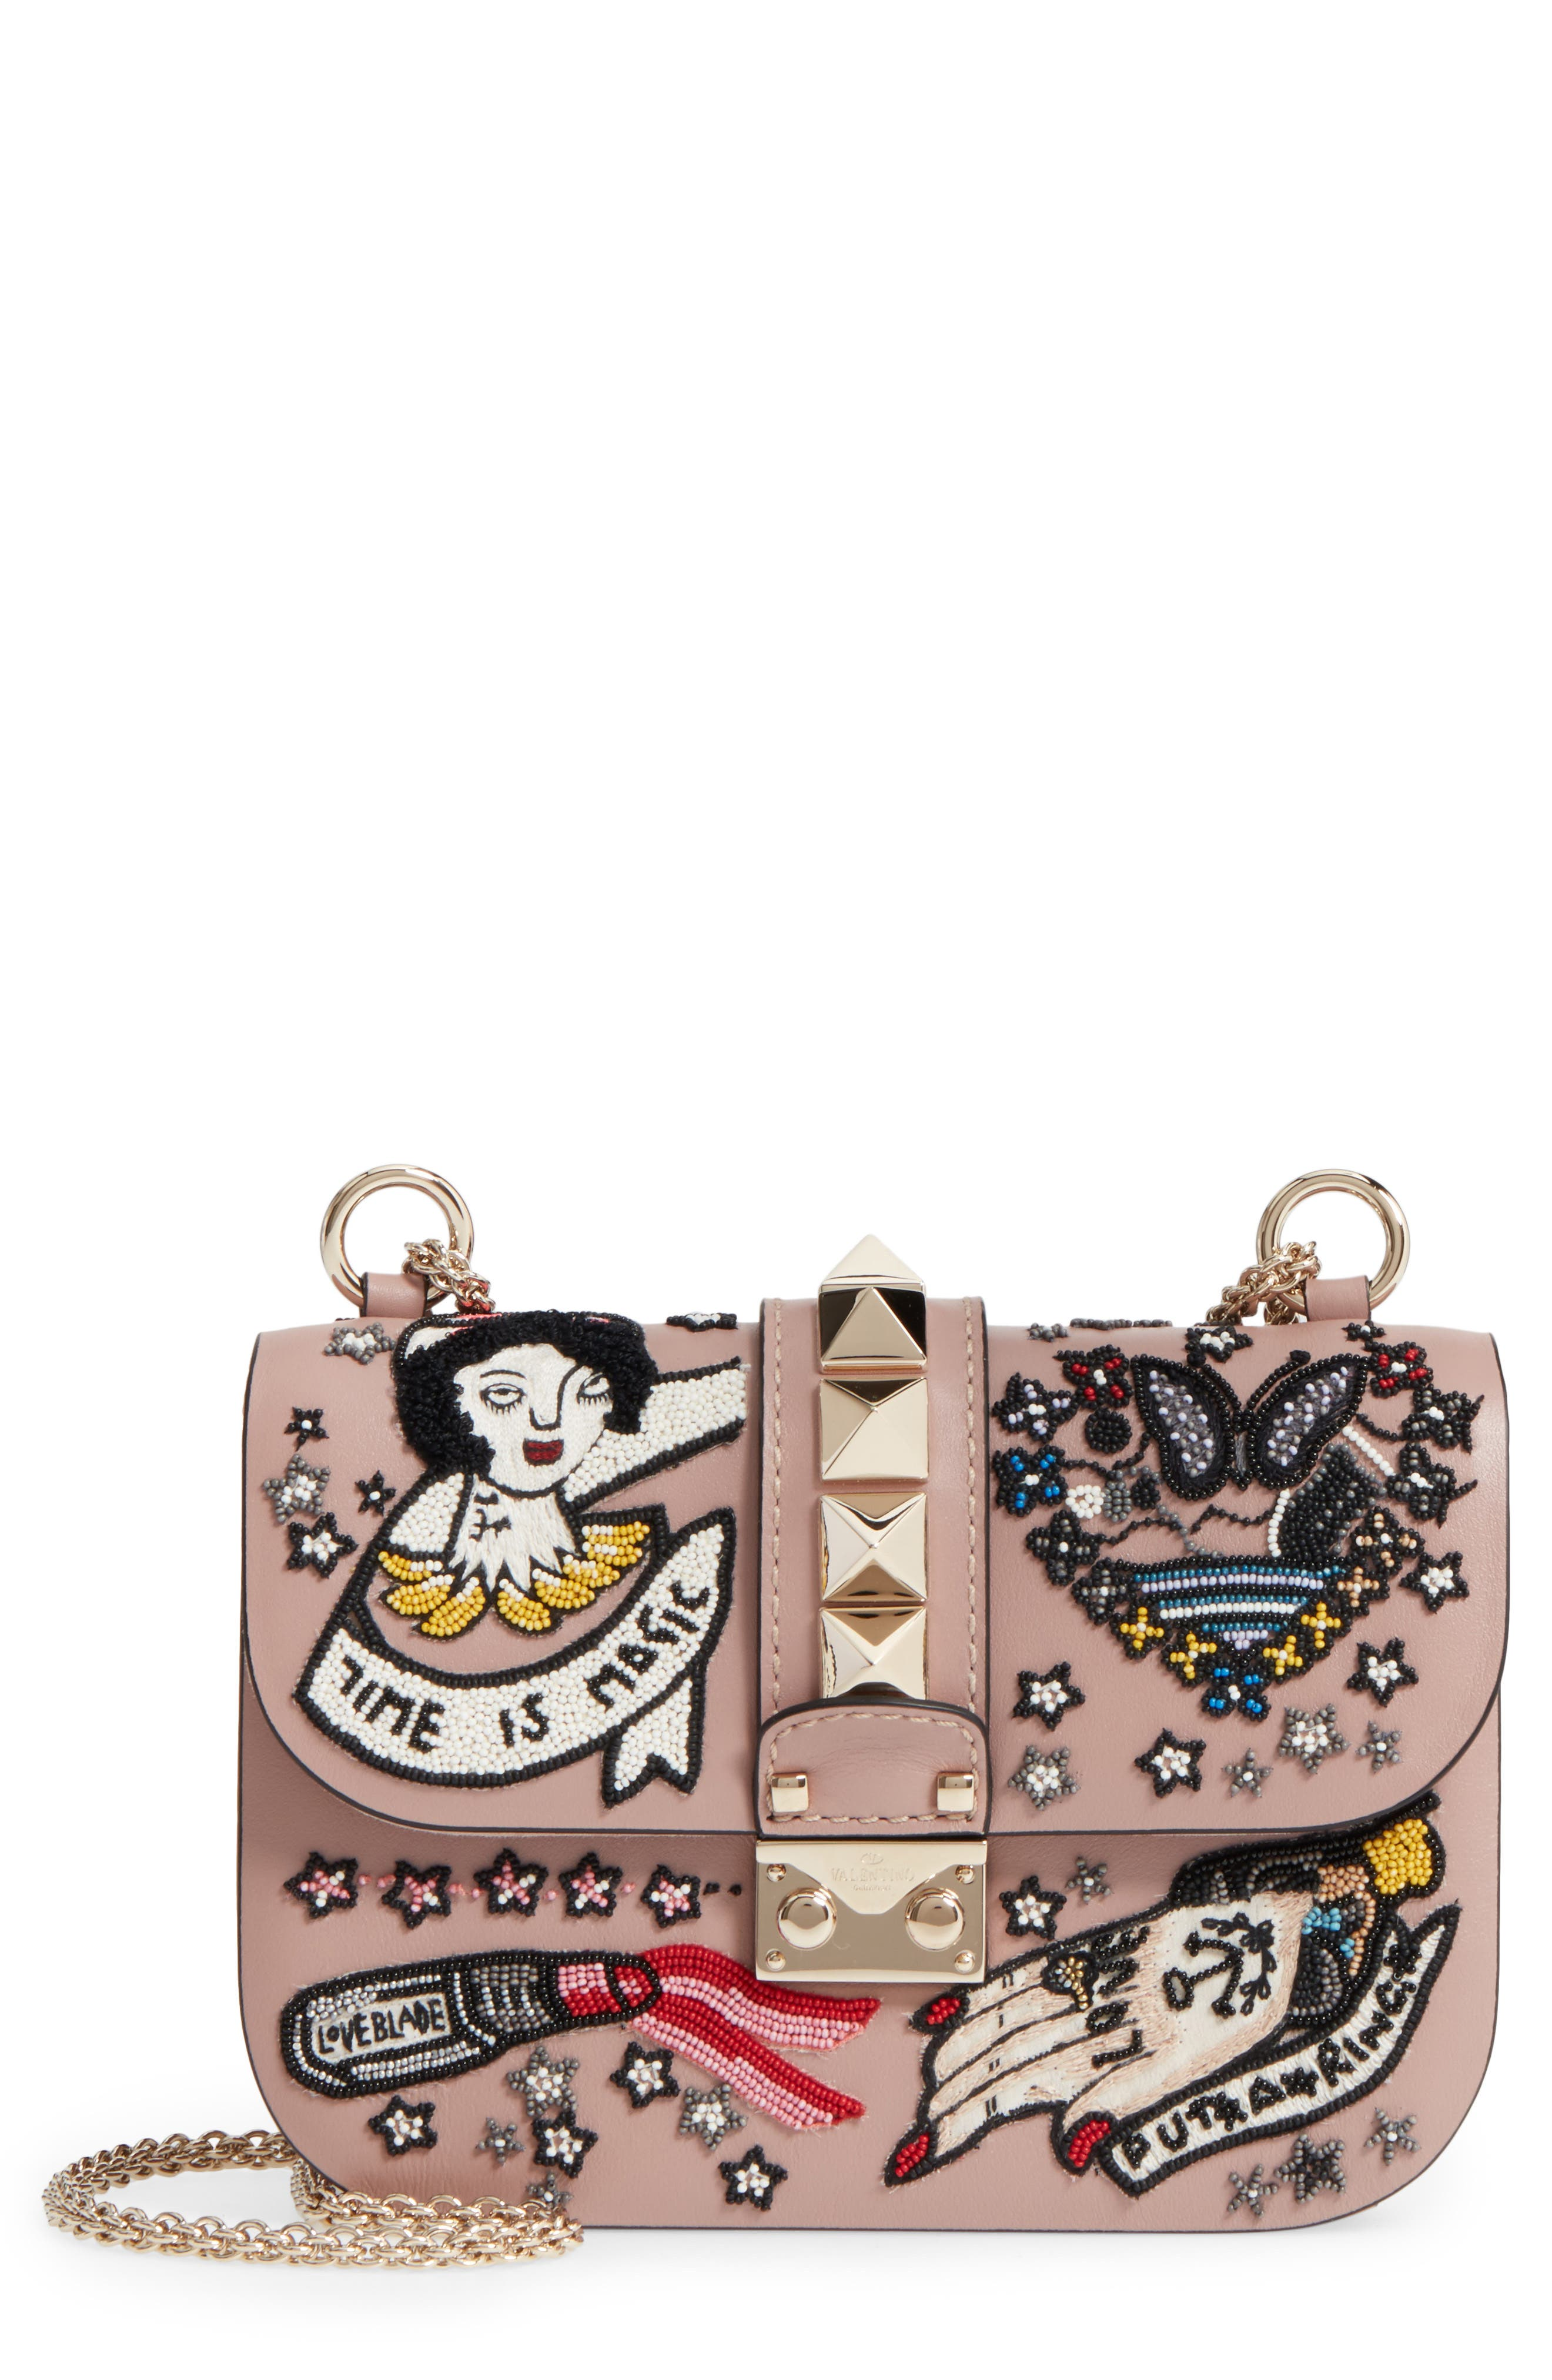 VALENTINO GARAVANI Small Time is Magic Embroidered Calfskin Leather Shoulder Bag